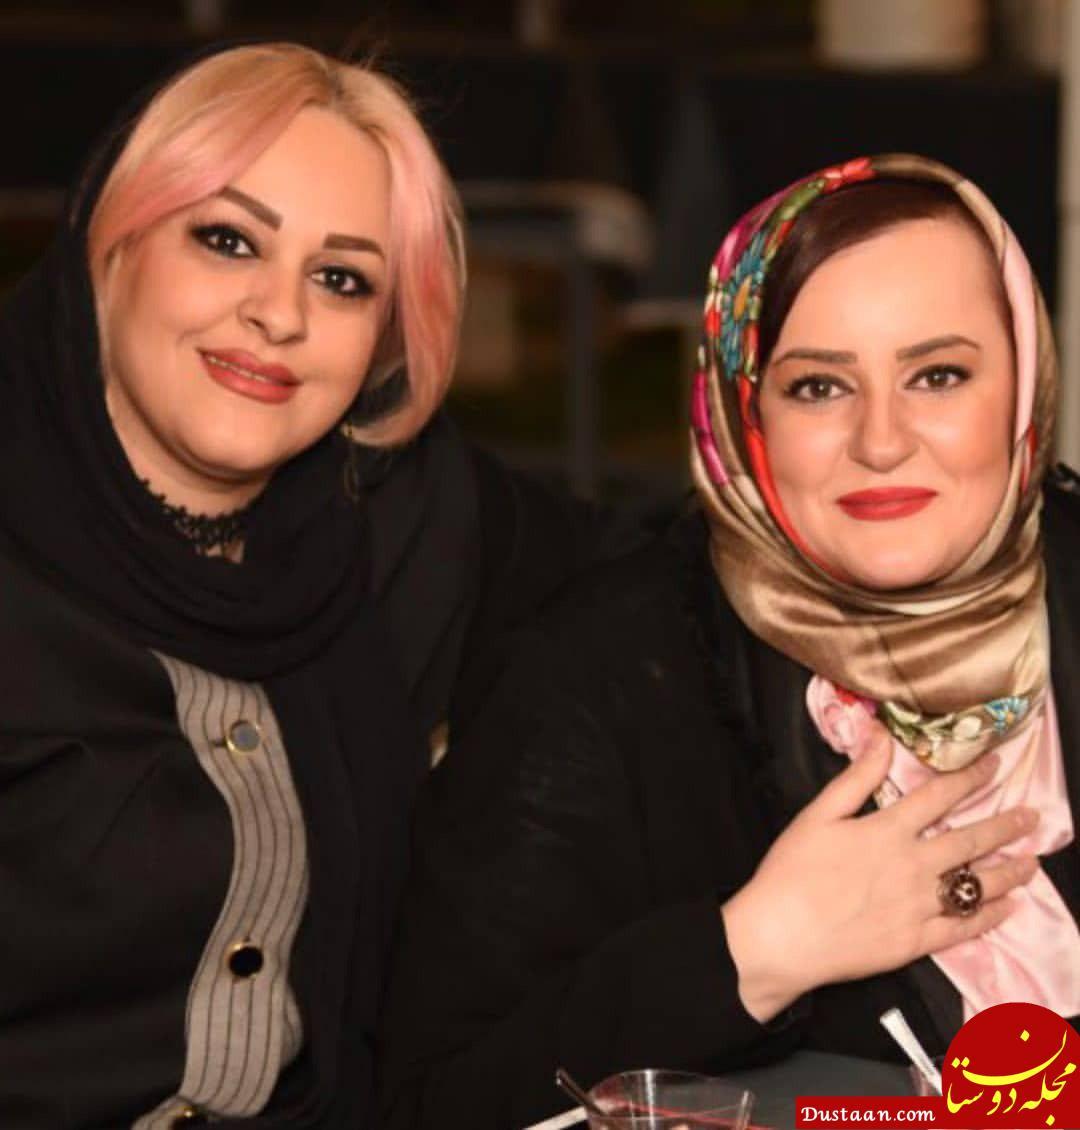 www.dustaan.com شباهت جالب نعیمه نظام دوست و خواهرش به هم!